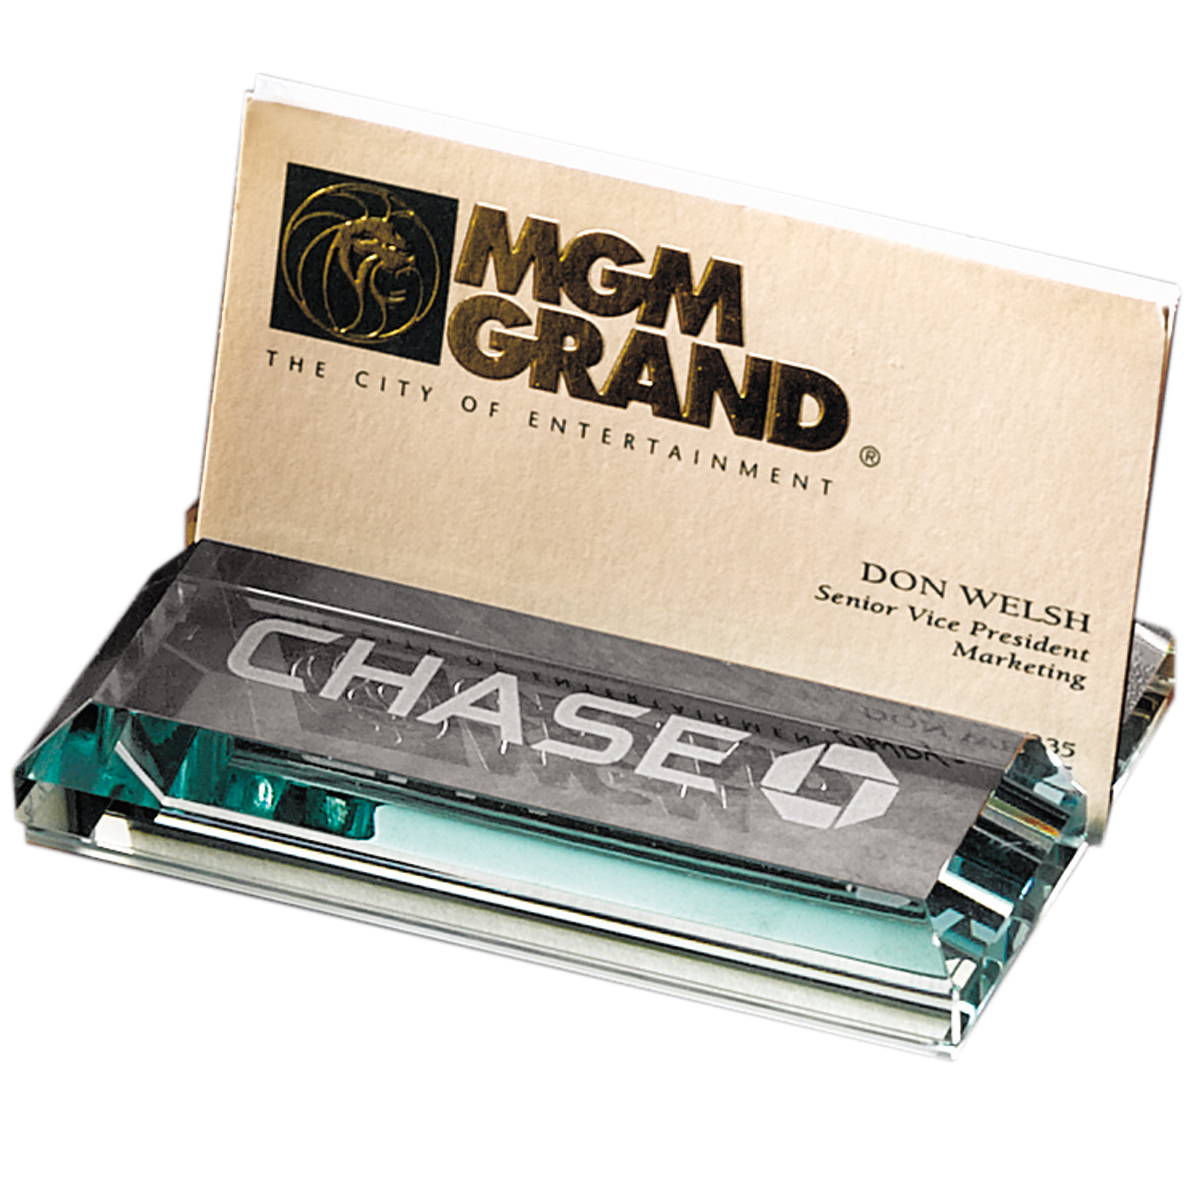 Customized Leeman Atrium Glass Business Card Holder   Promotional ...